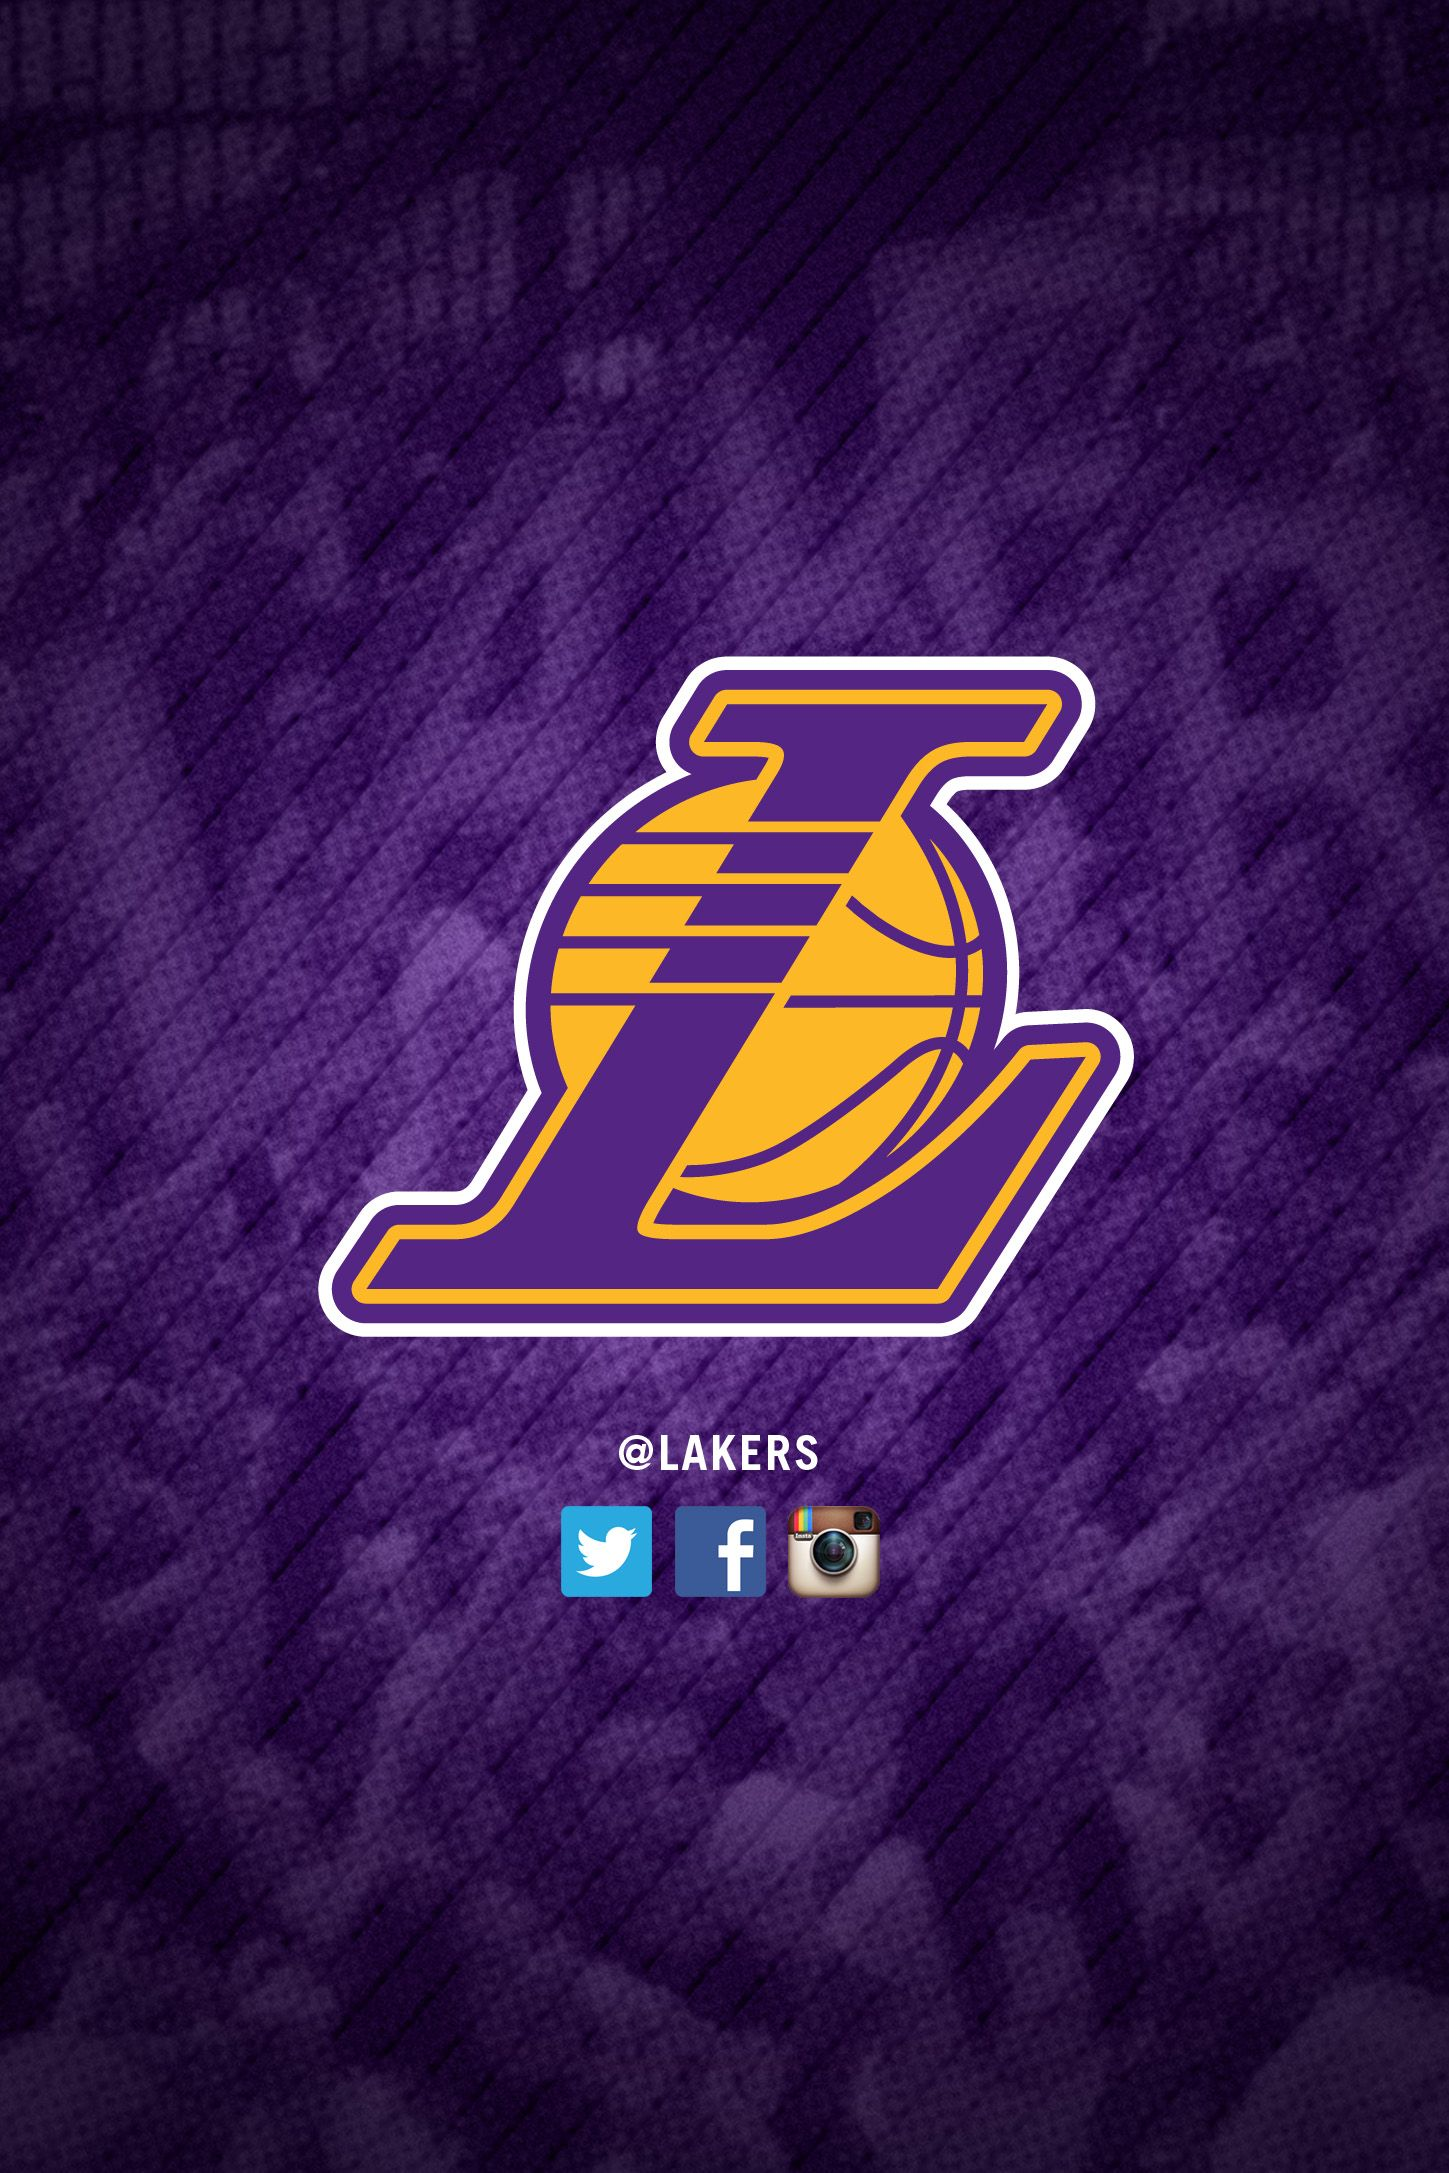 Lakers Wallpaper Ipad Mini Lakers Wallpaper Ipad Mini Wallpaper